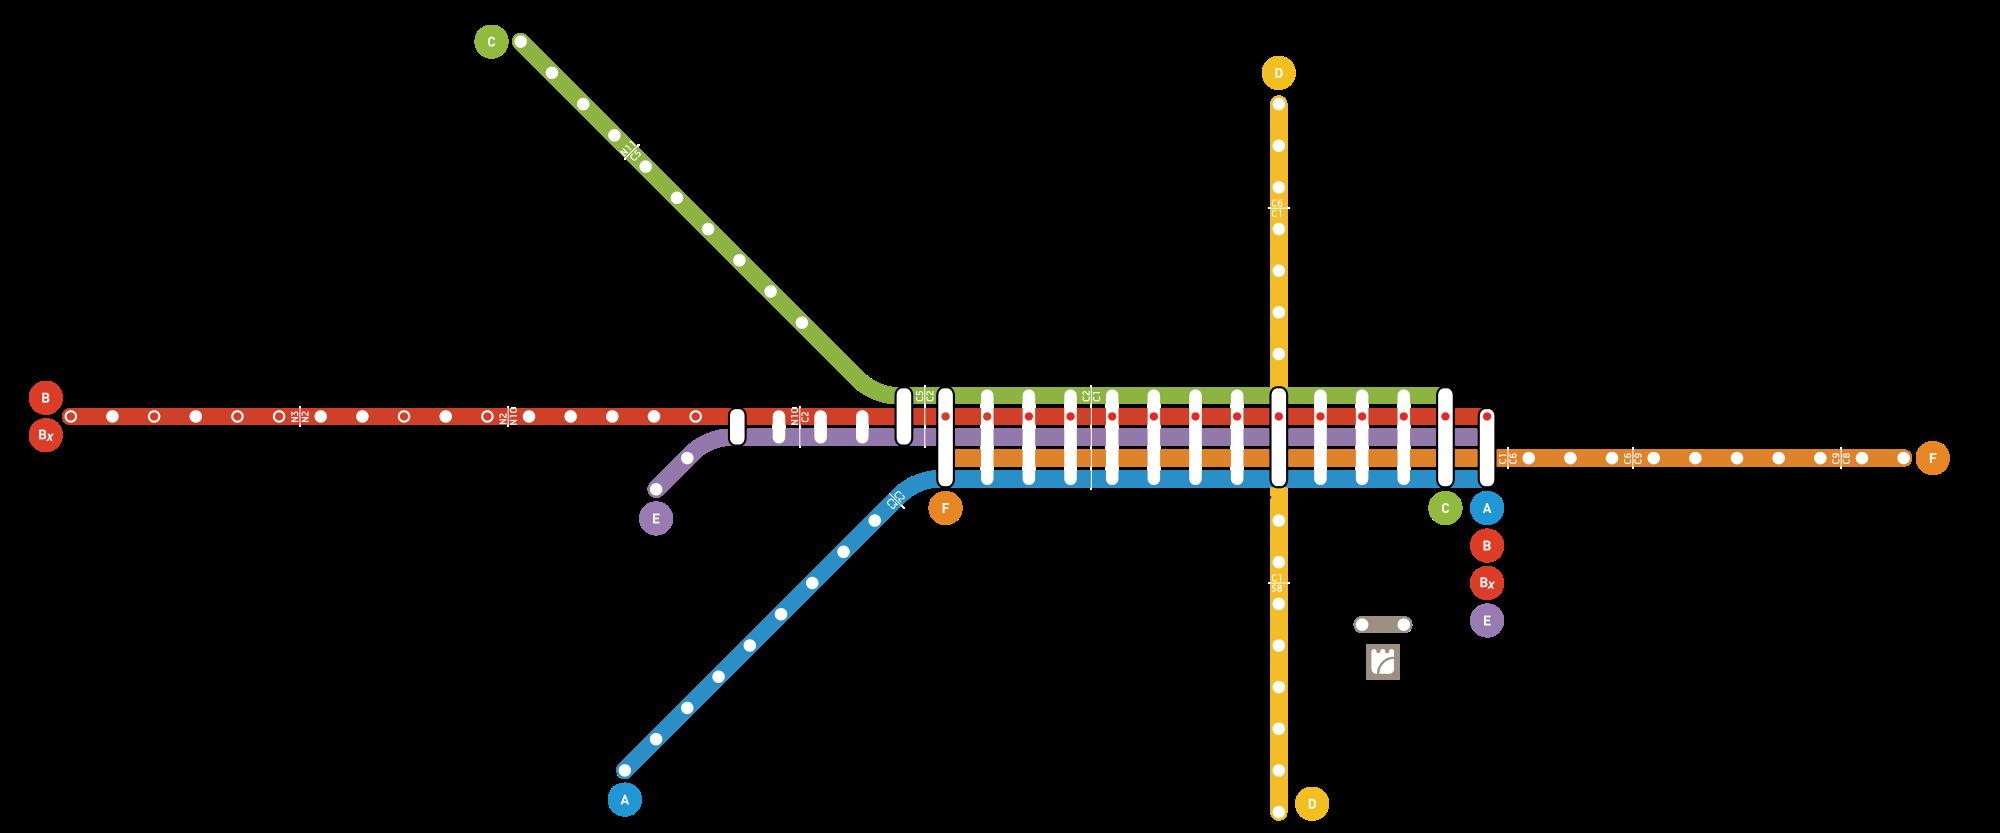 Metro De Oporto Mapa.Metro De Oporto Mapa Y Lineas Para Moverse En Metro